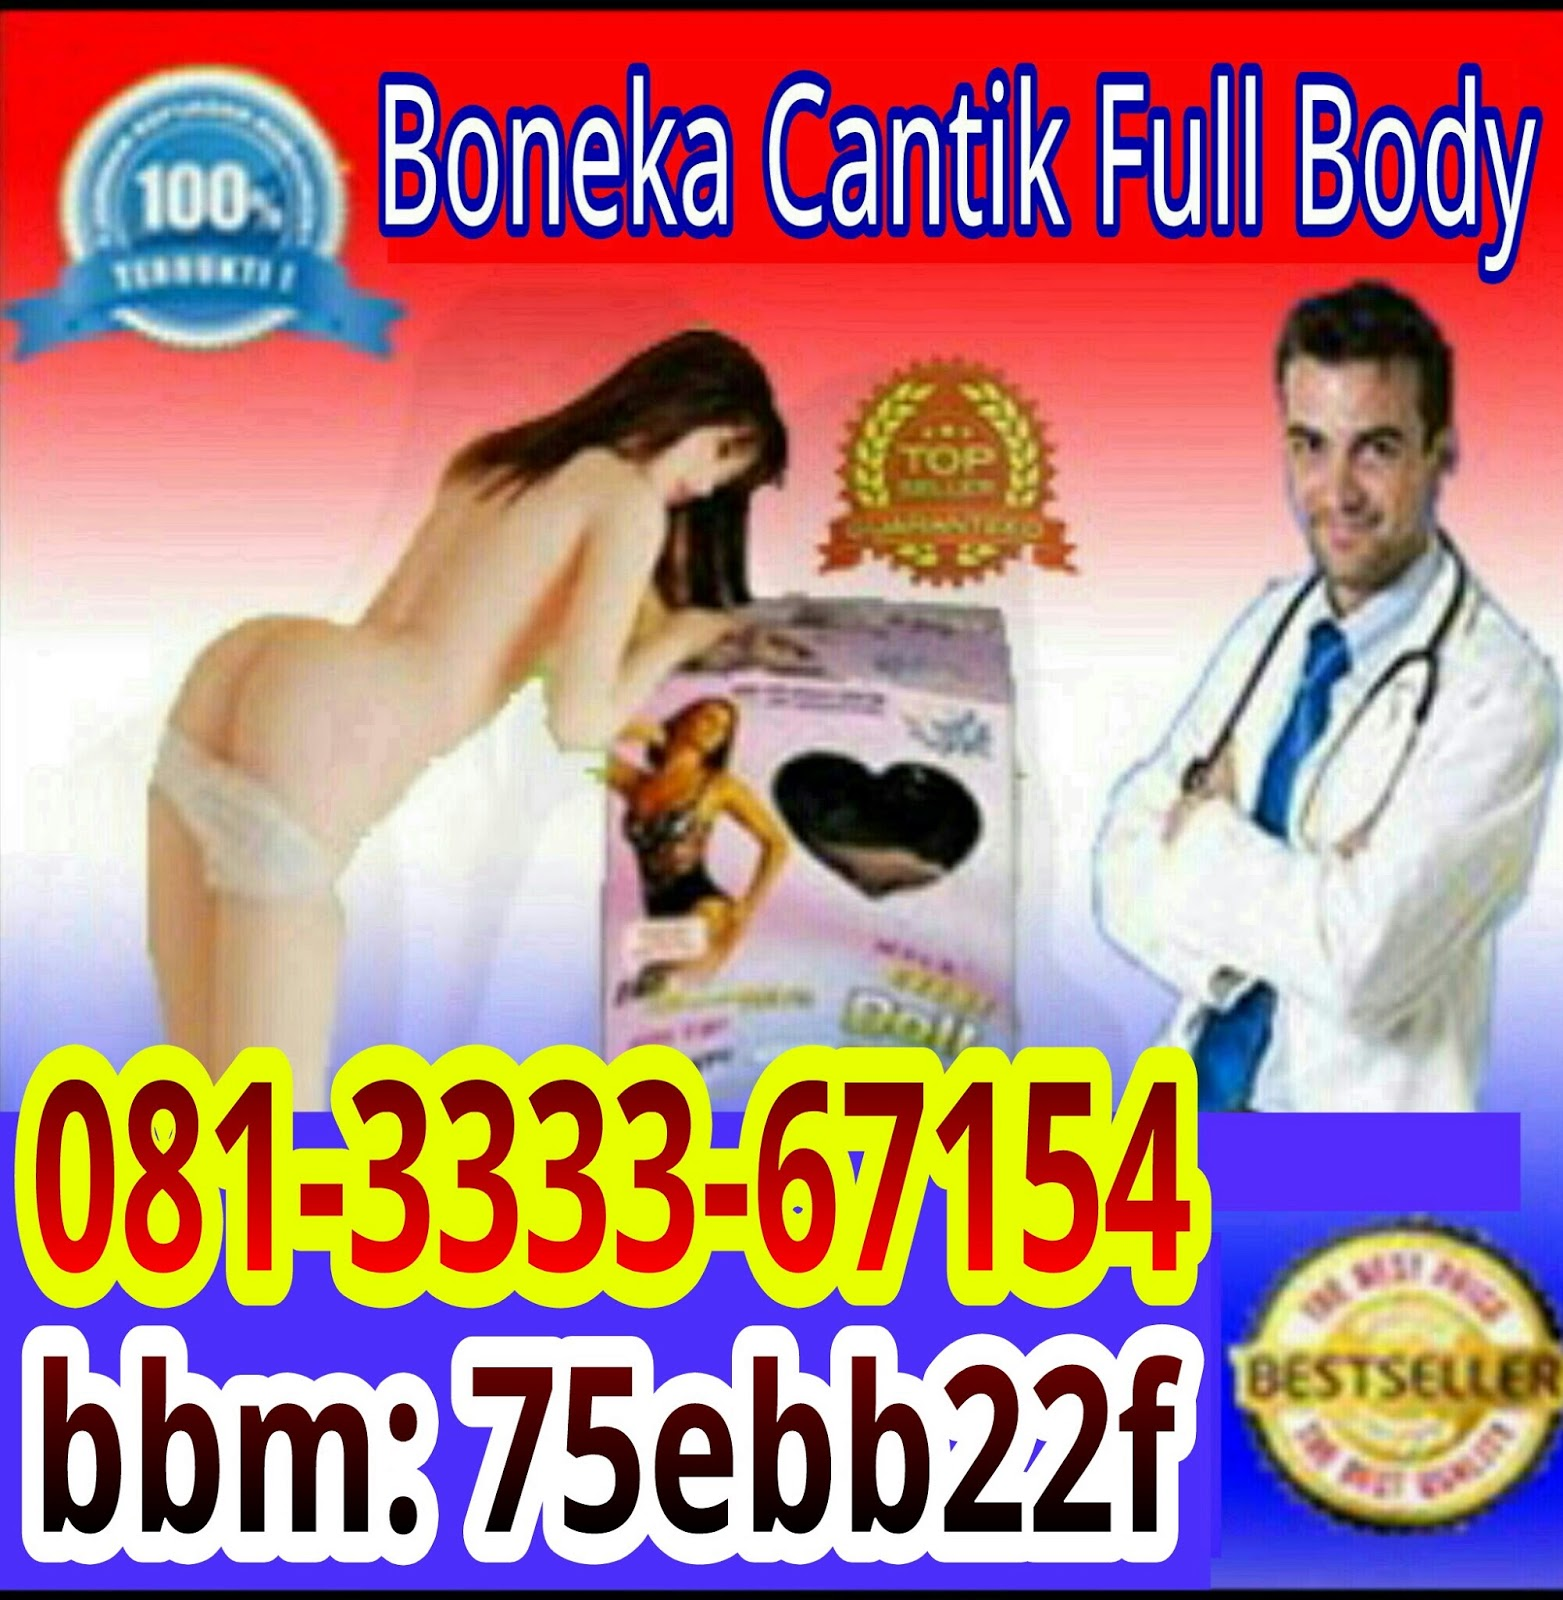 Boneka full bodi cantik -. Source · Click here to see a large version. ALAT  BANTU SEX PRIA BONEKA FULL BODY WANITA f3225338be